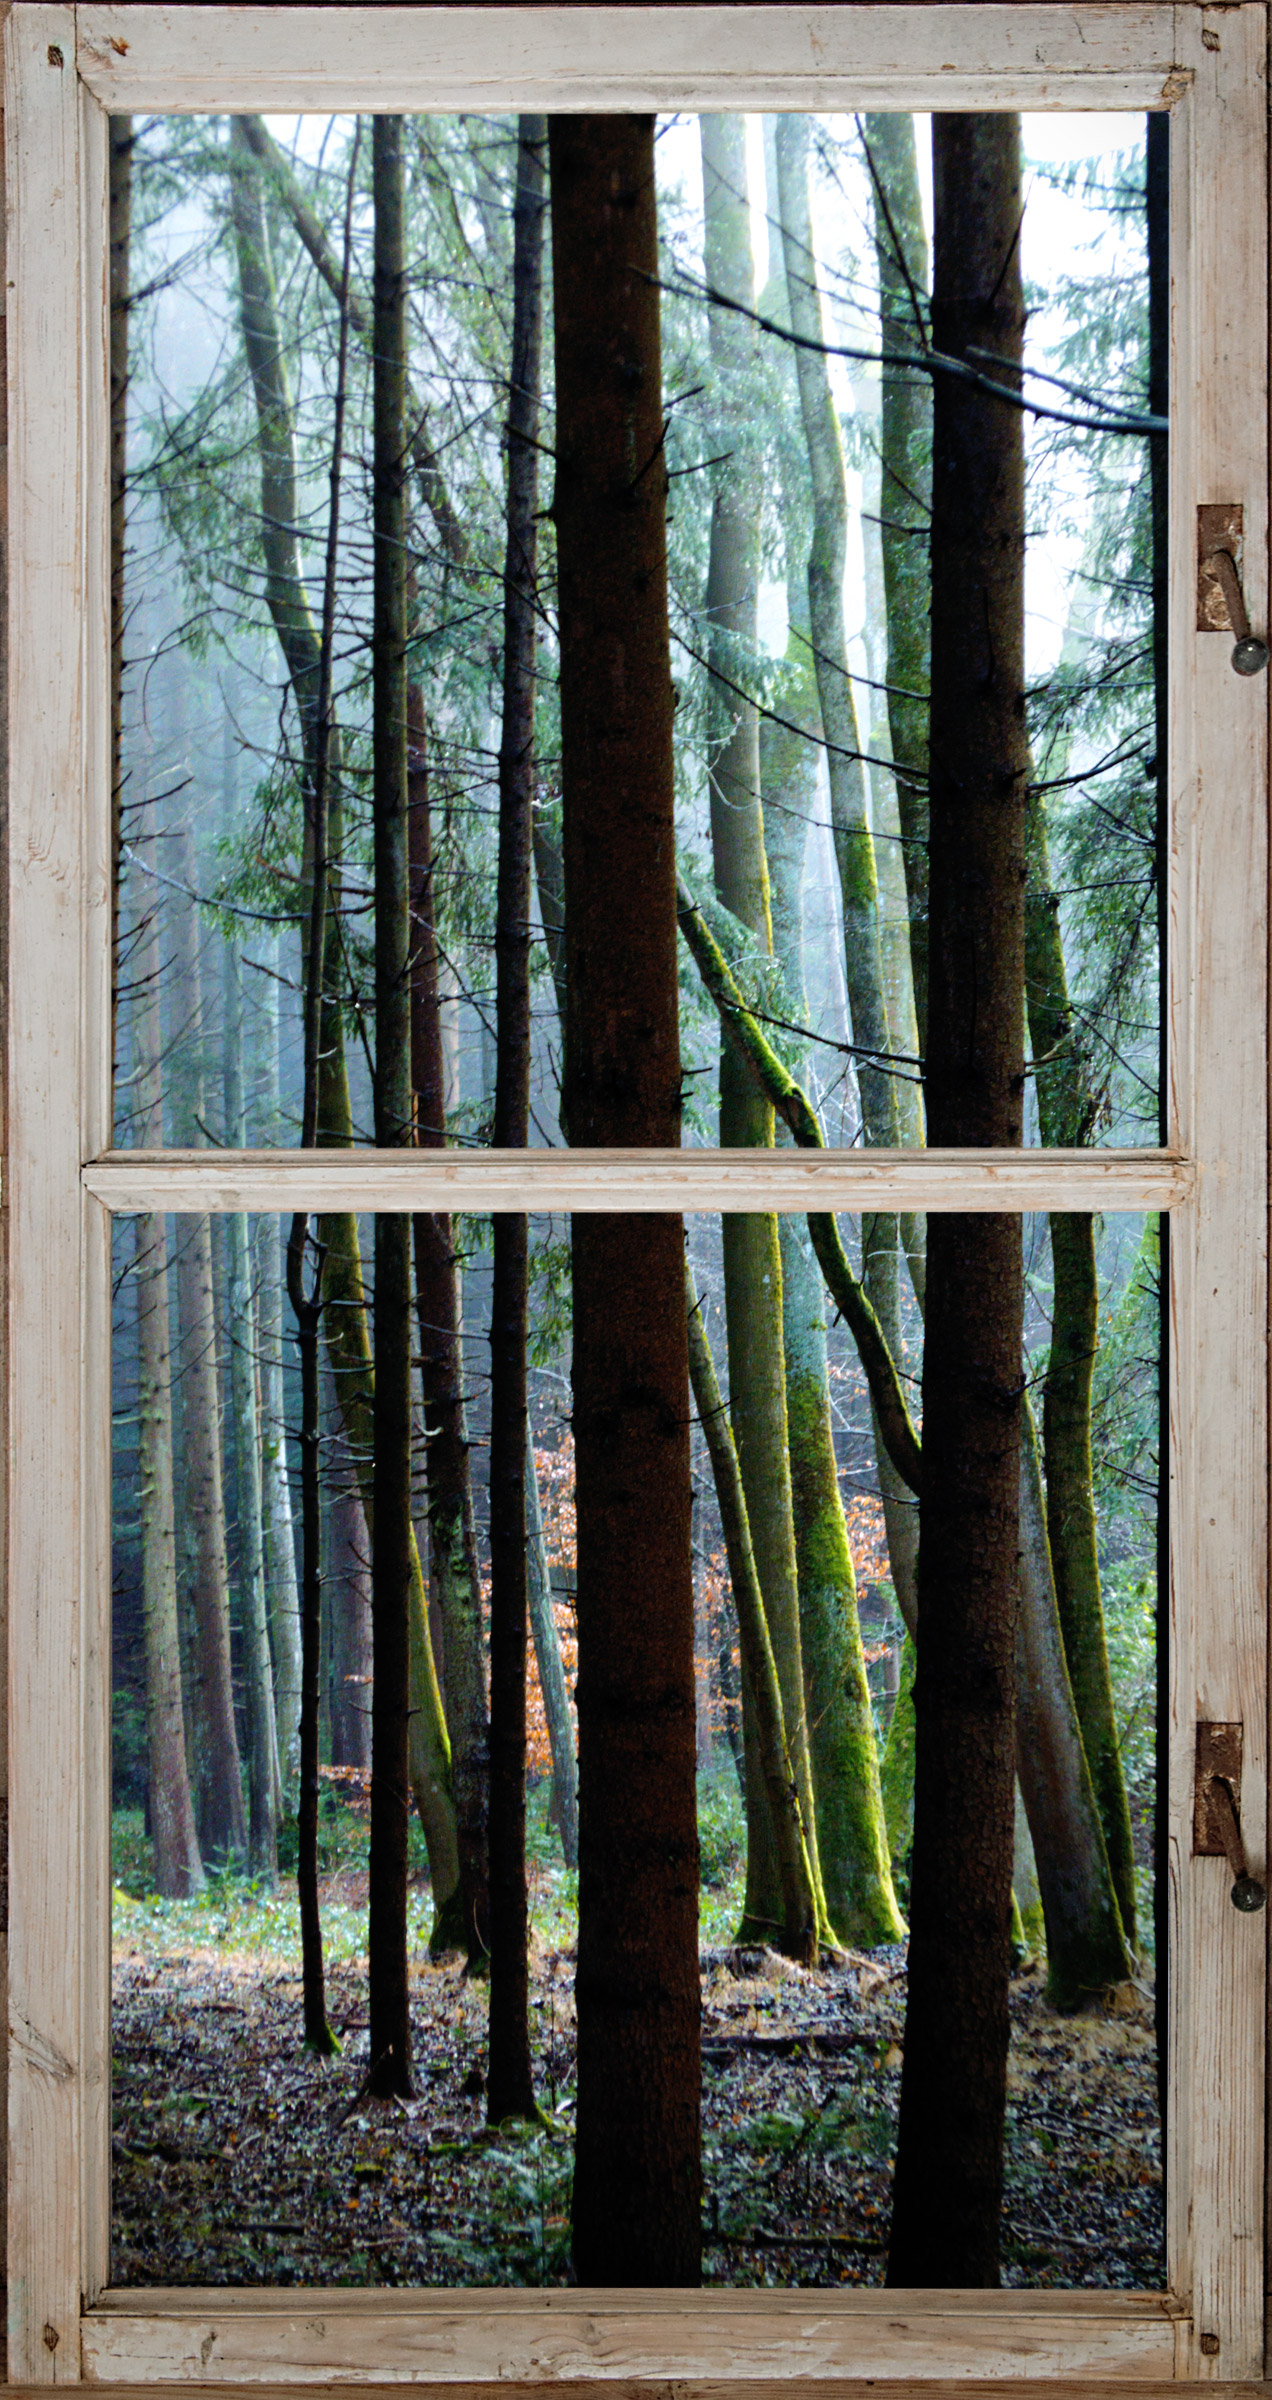 ausblickwaldmitfenster